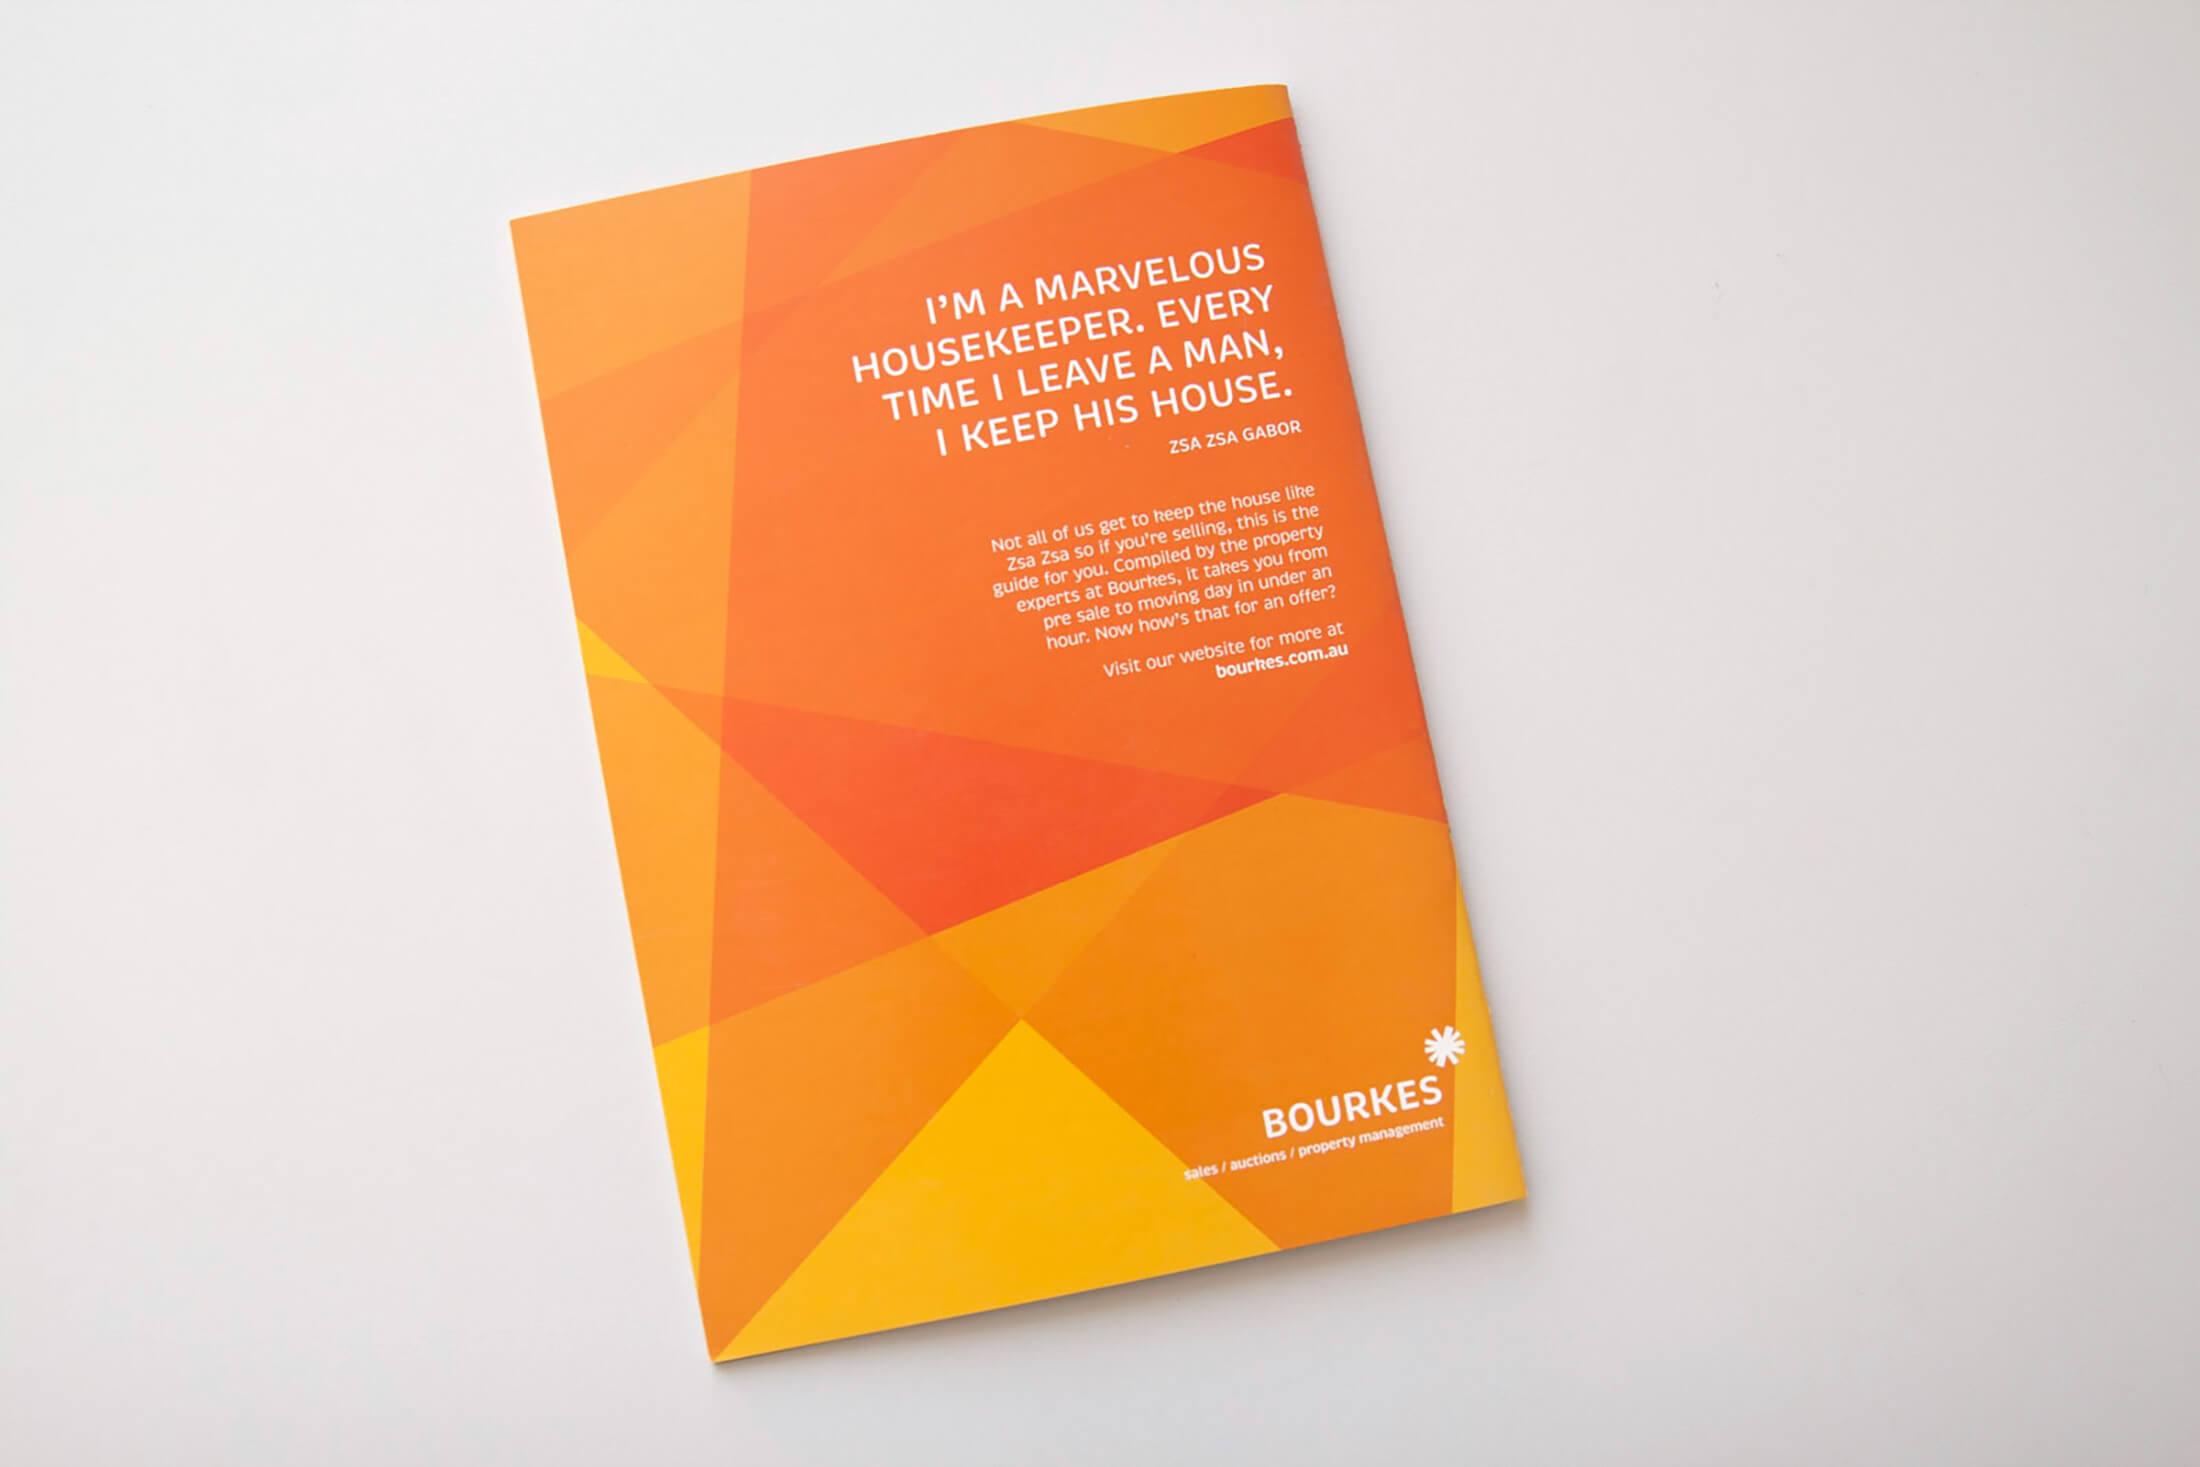 bourkes-realestate-brochure-backcover1